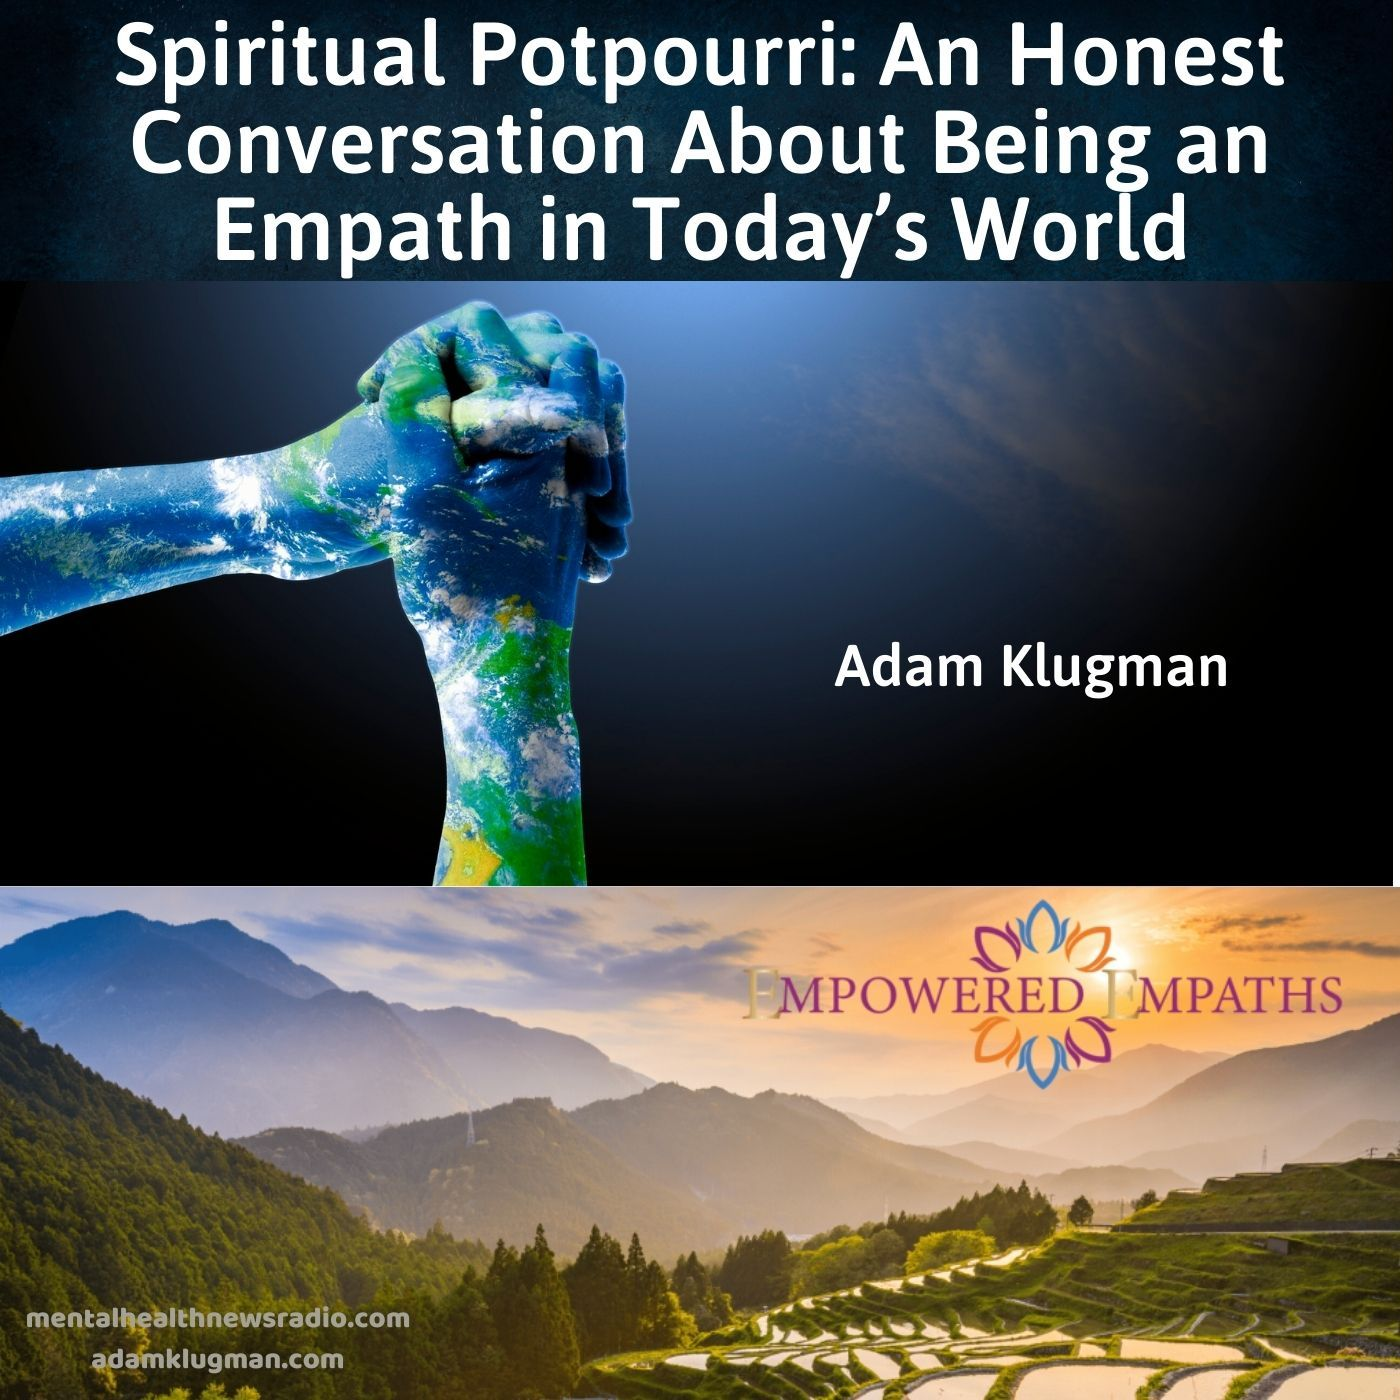 Spiritual Potpourri: An Honest Conversation About Being an Empath in Today's World